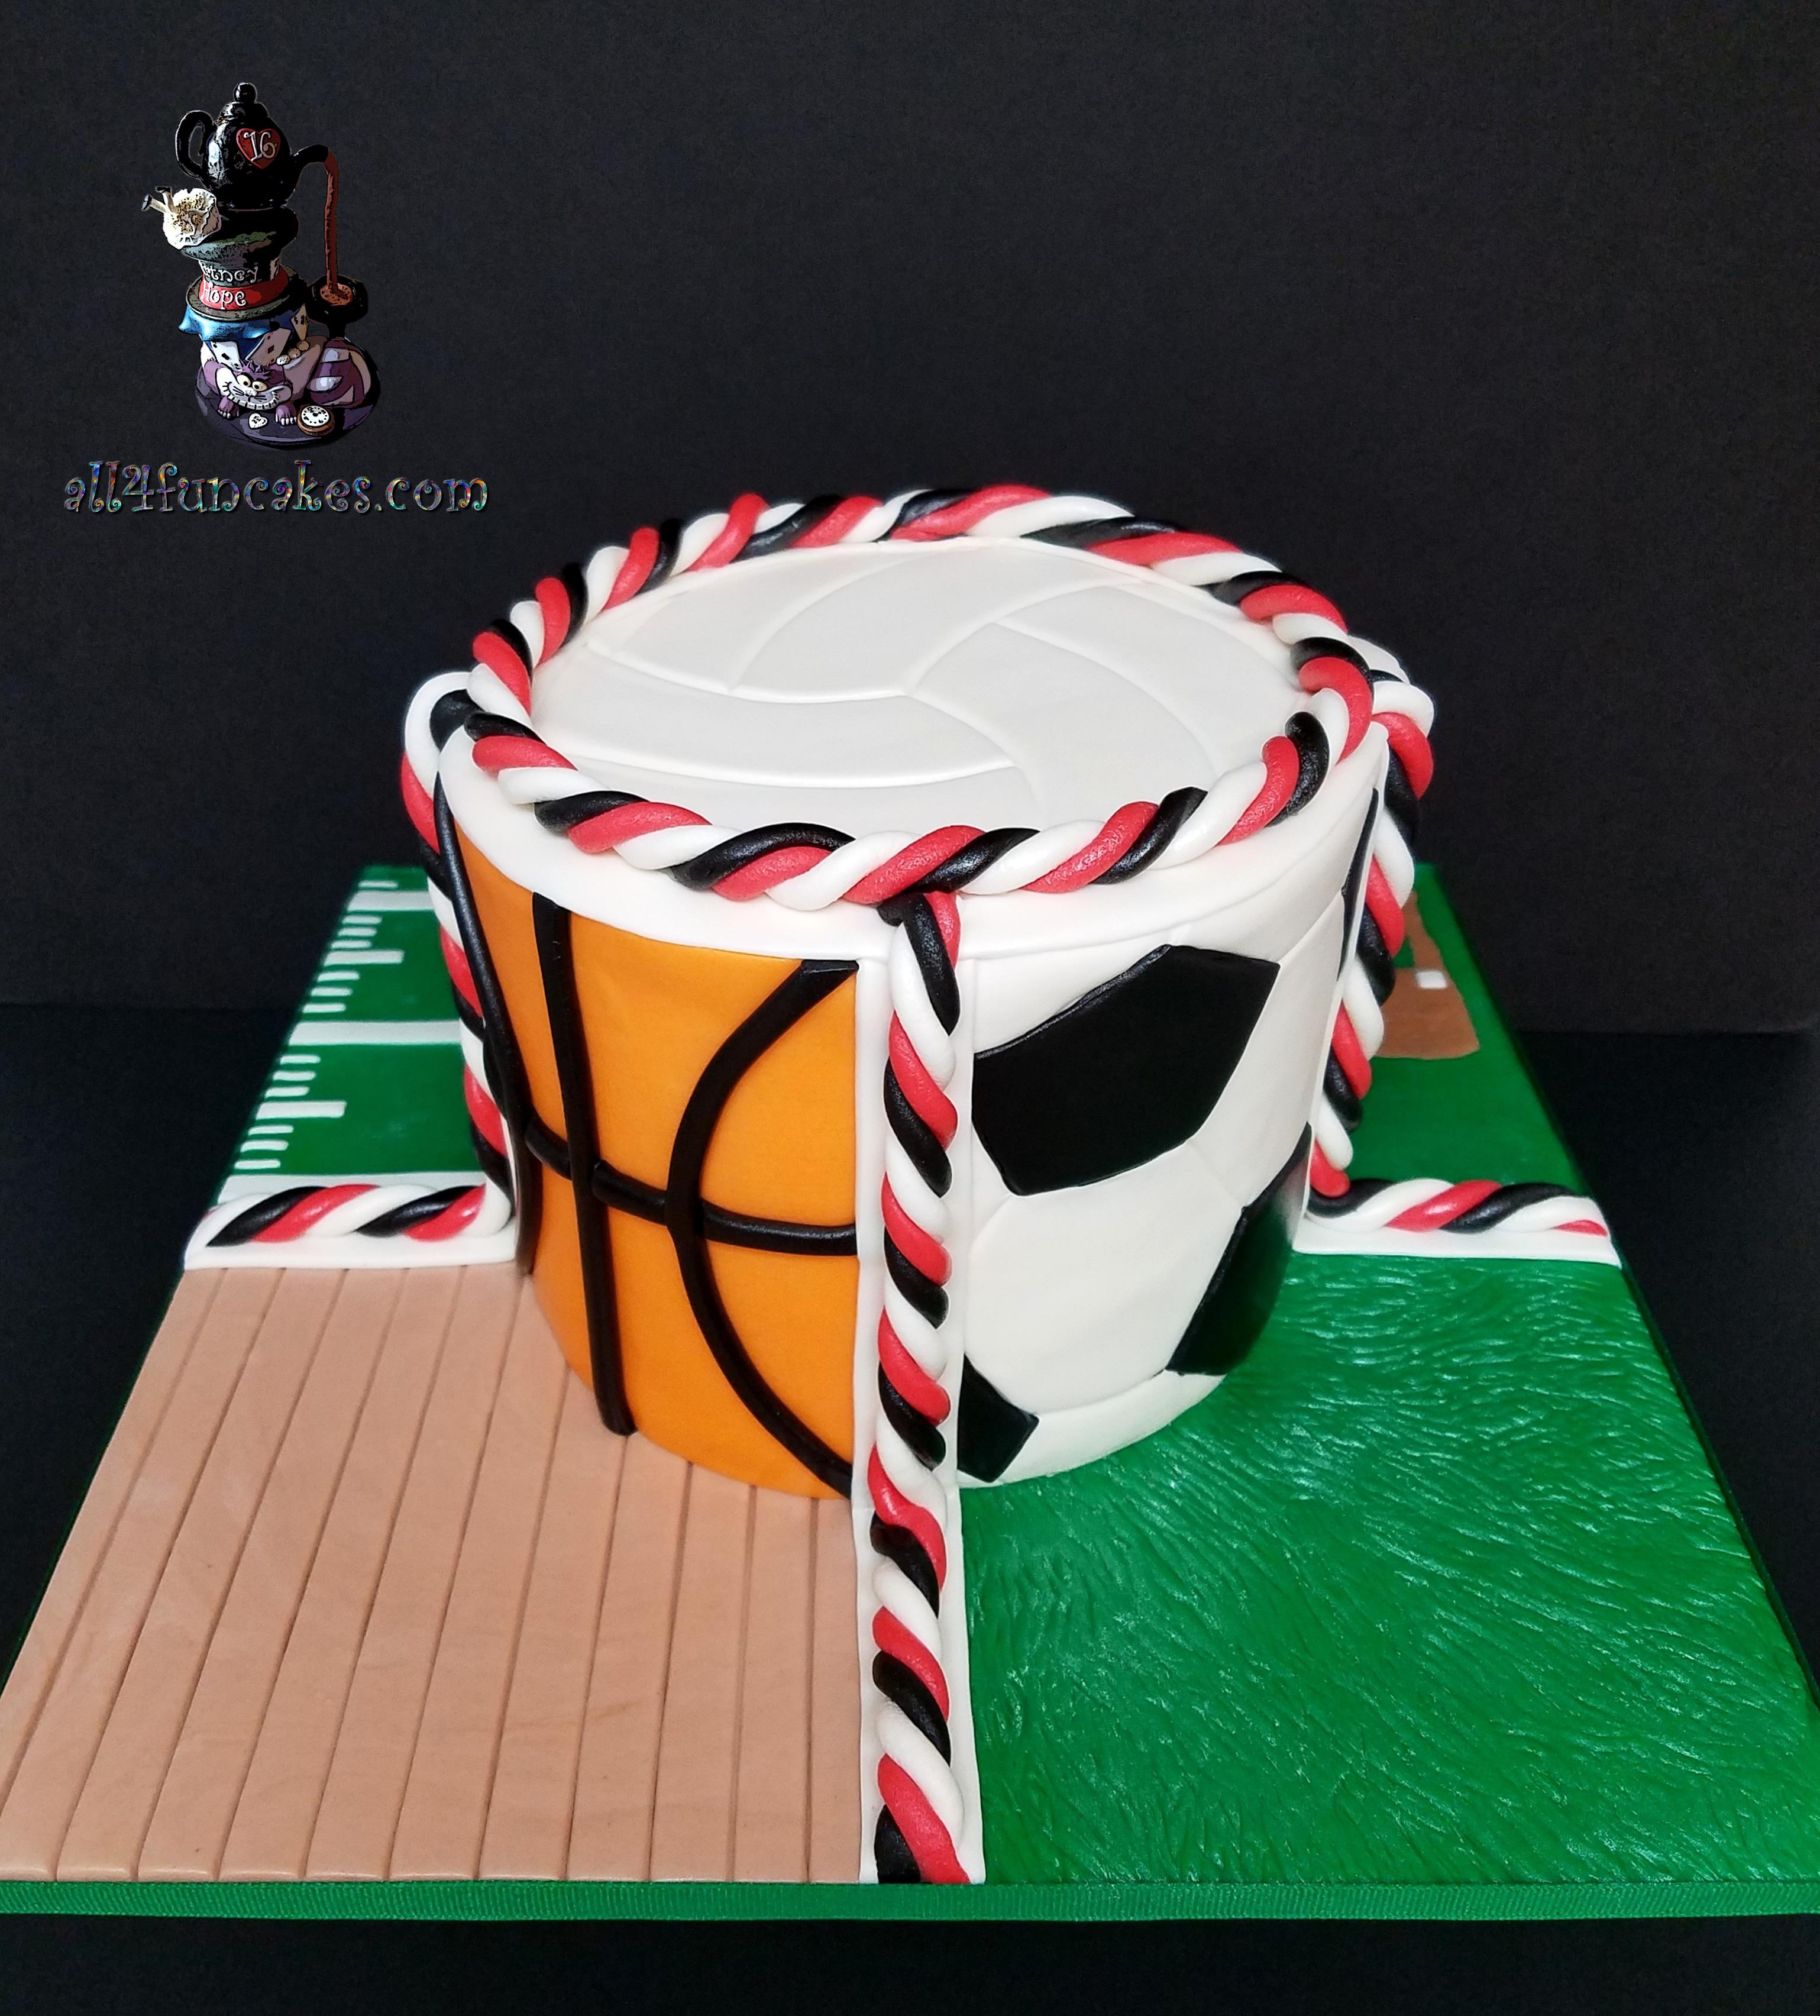 Sports Soccer Baseball Football Basketball Physical Education PE Special Occasion Cake for Beavercreek Elementary PTO Fundraiser by All4Fun Cakes LLC 2018